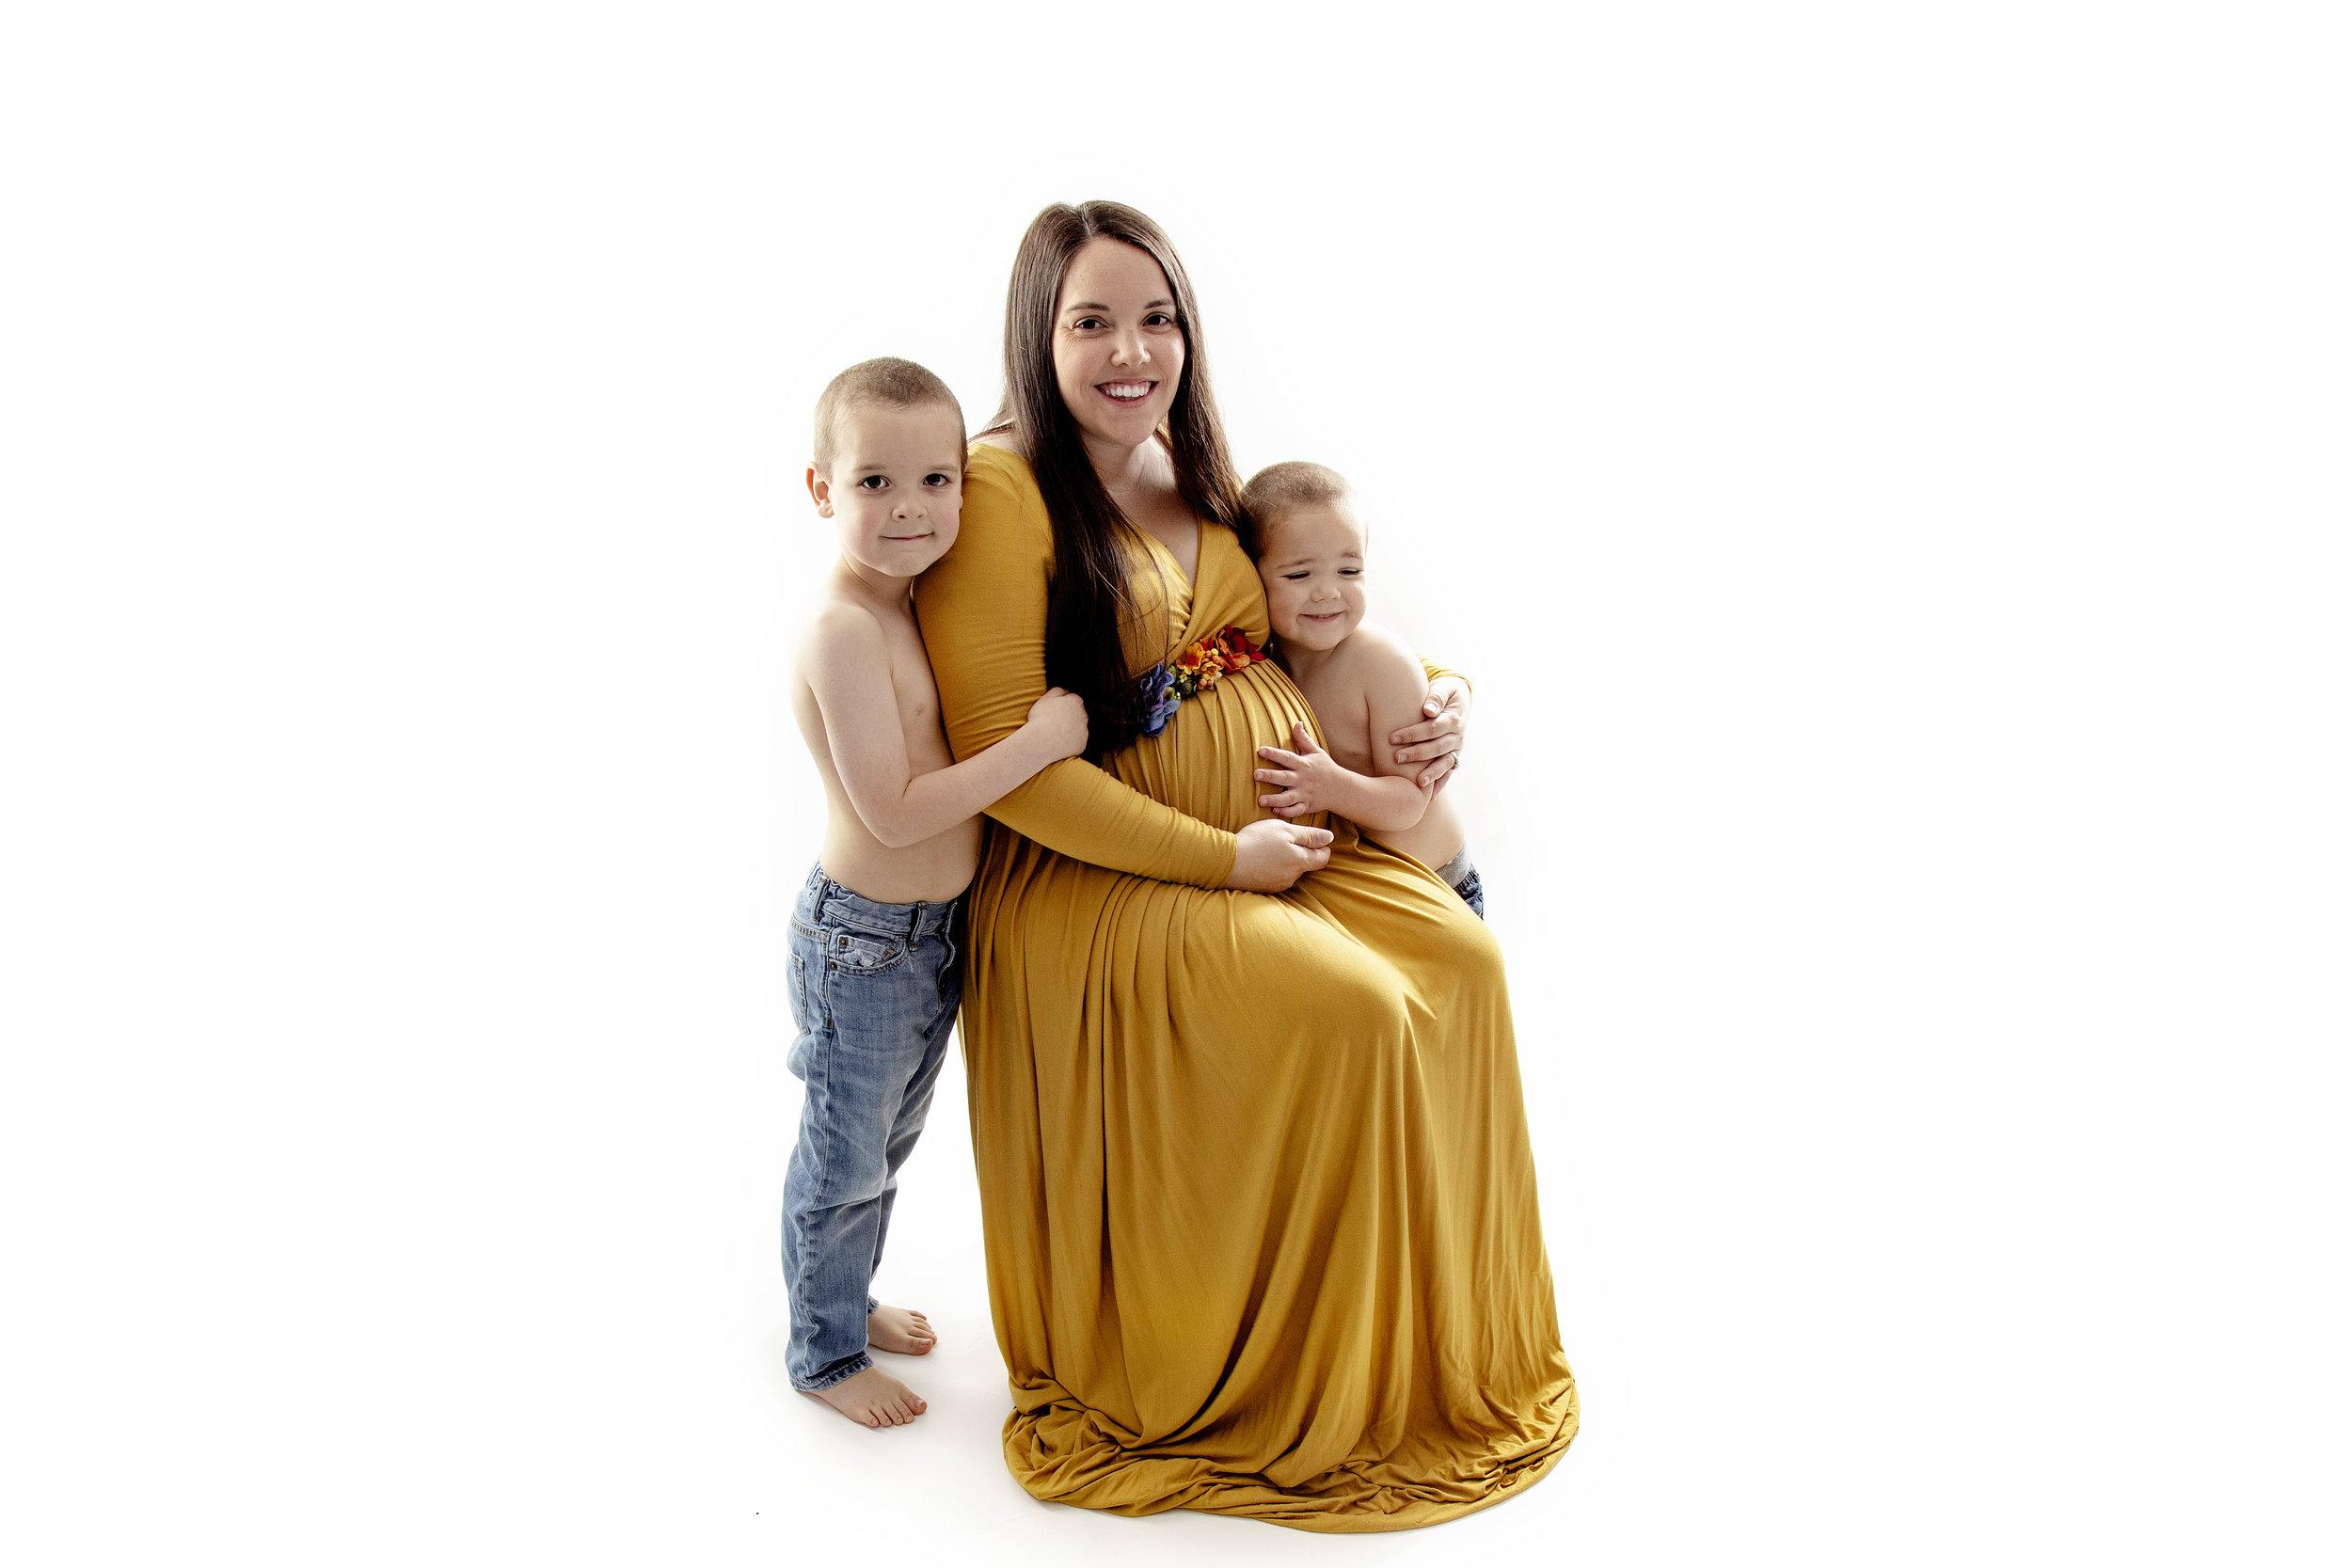 Angie_Englerth_Maternity_004.jpg